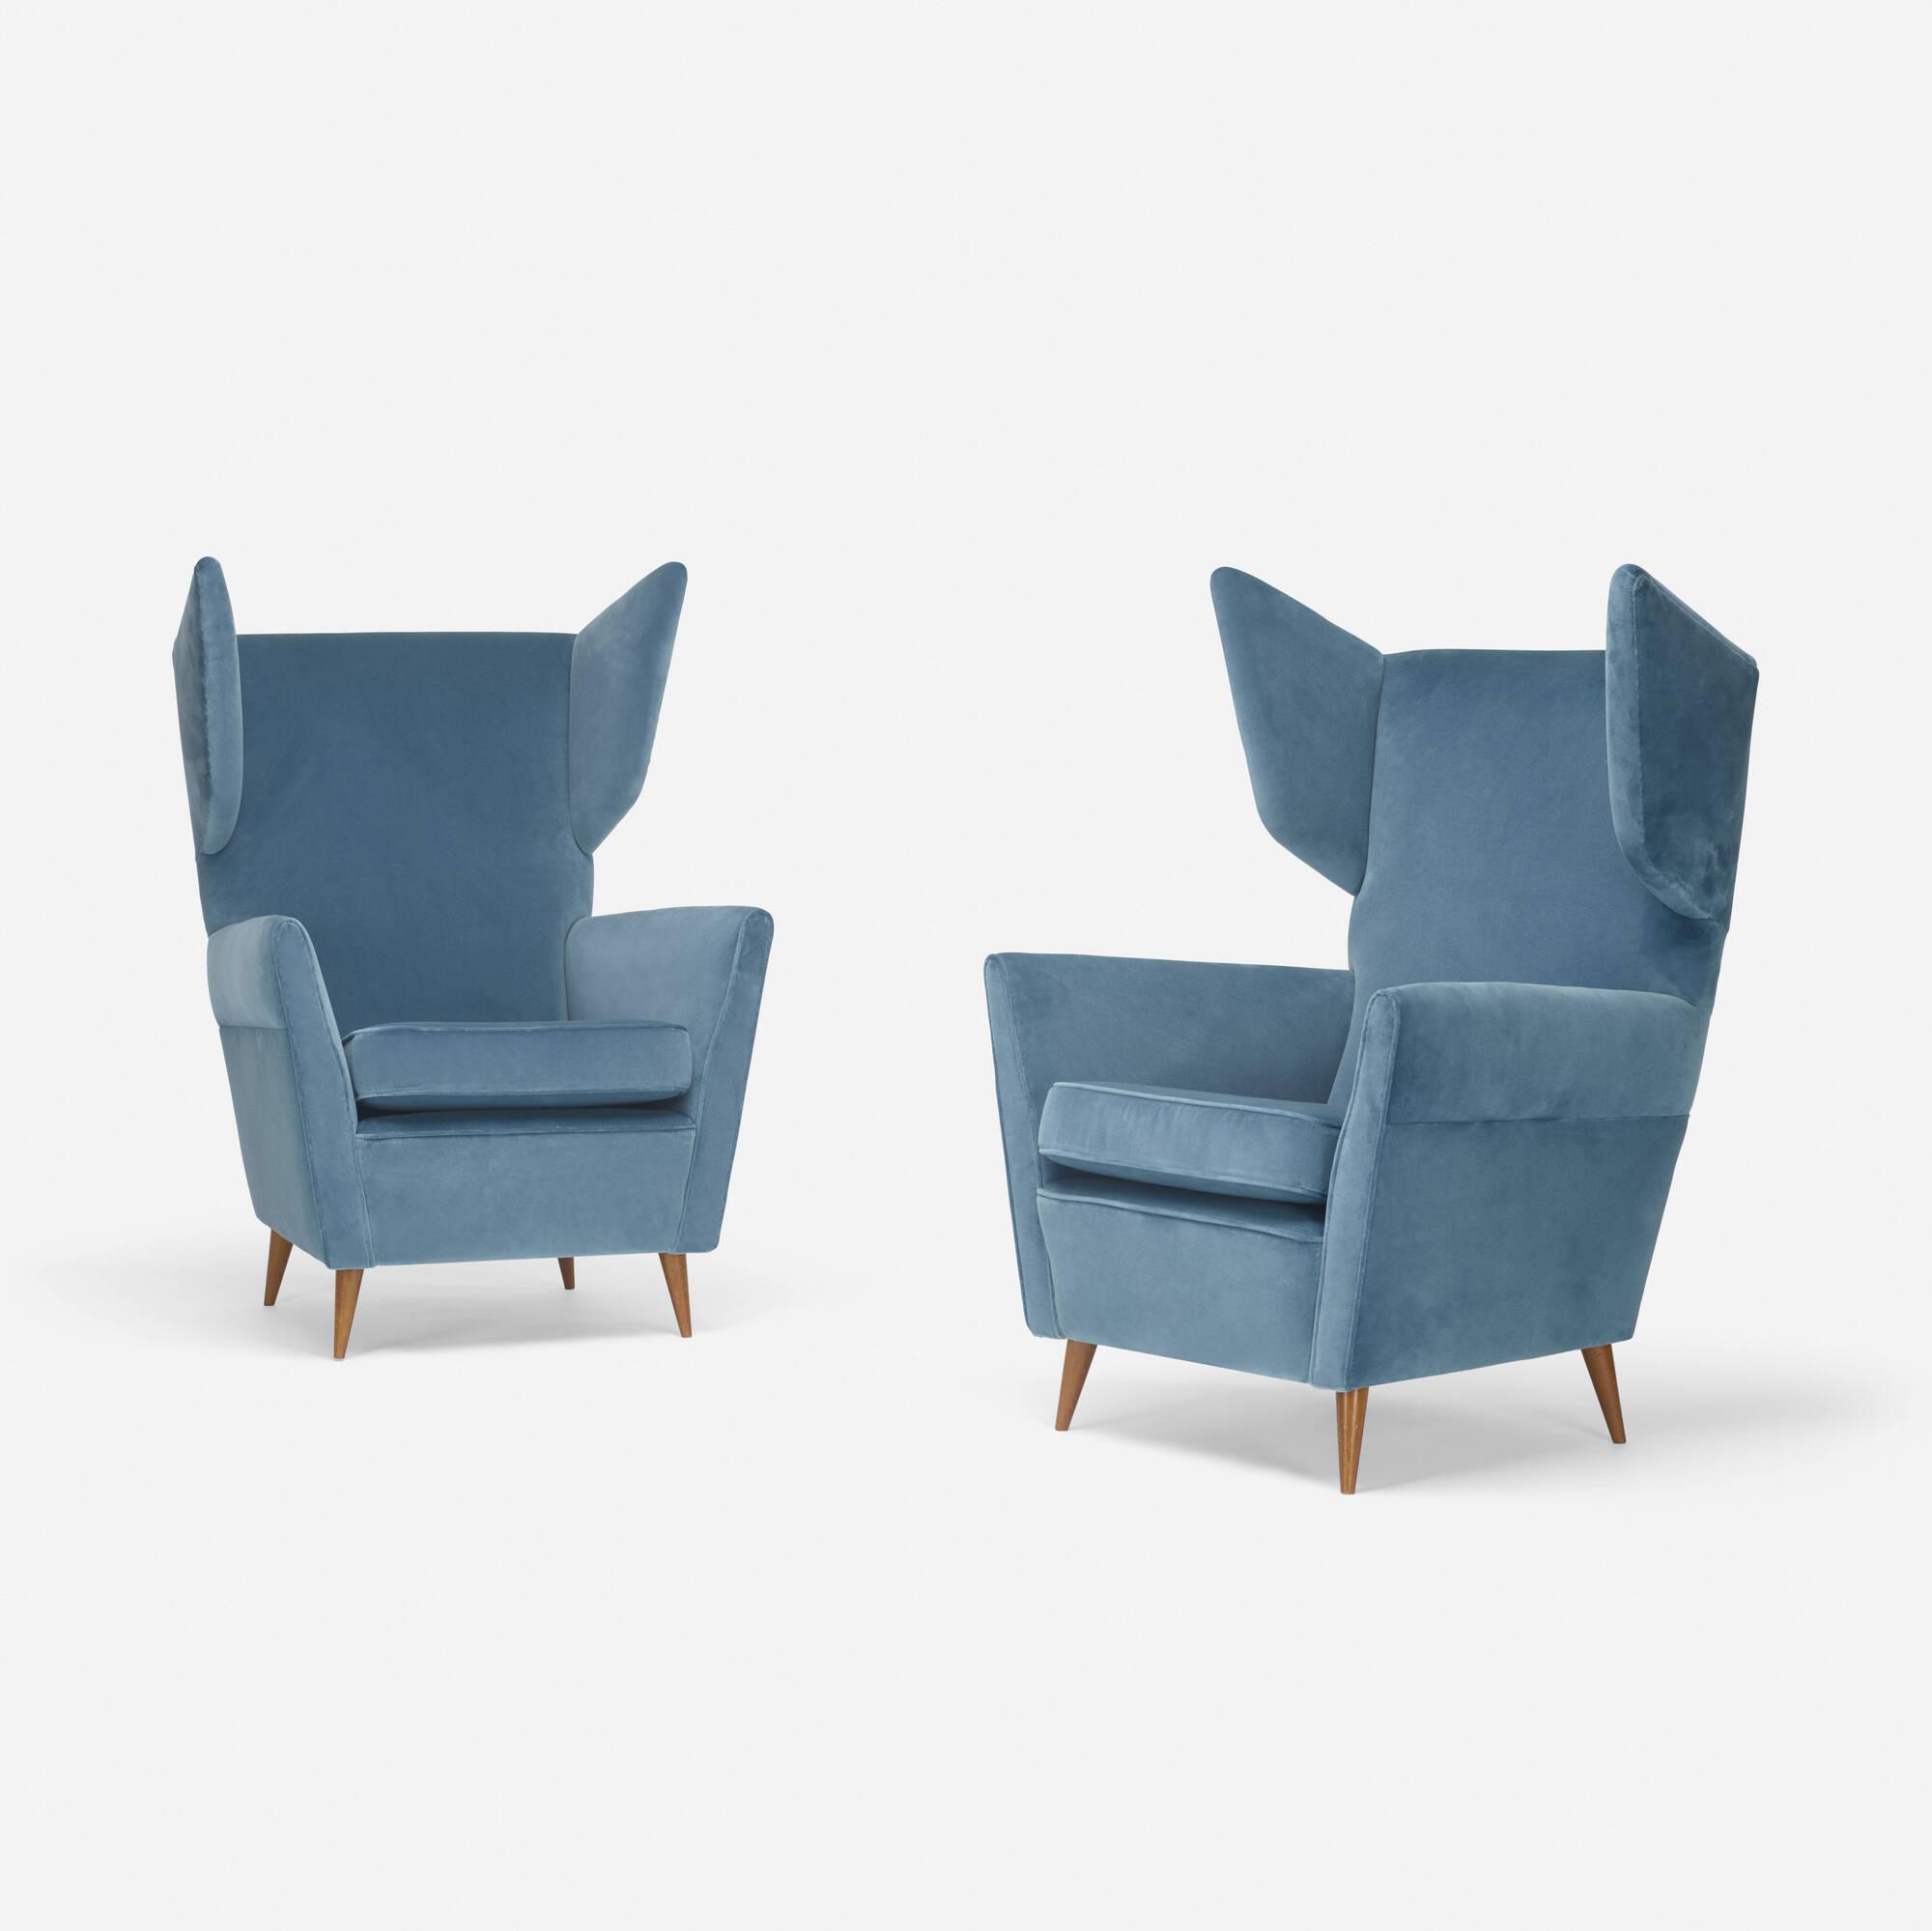 Beau 209: Gio Ponti / Lounge Chairs, Pair (1 Of 3)